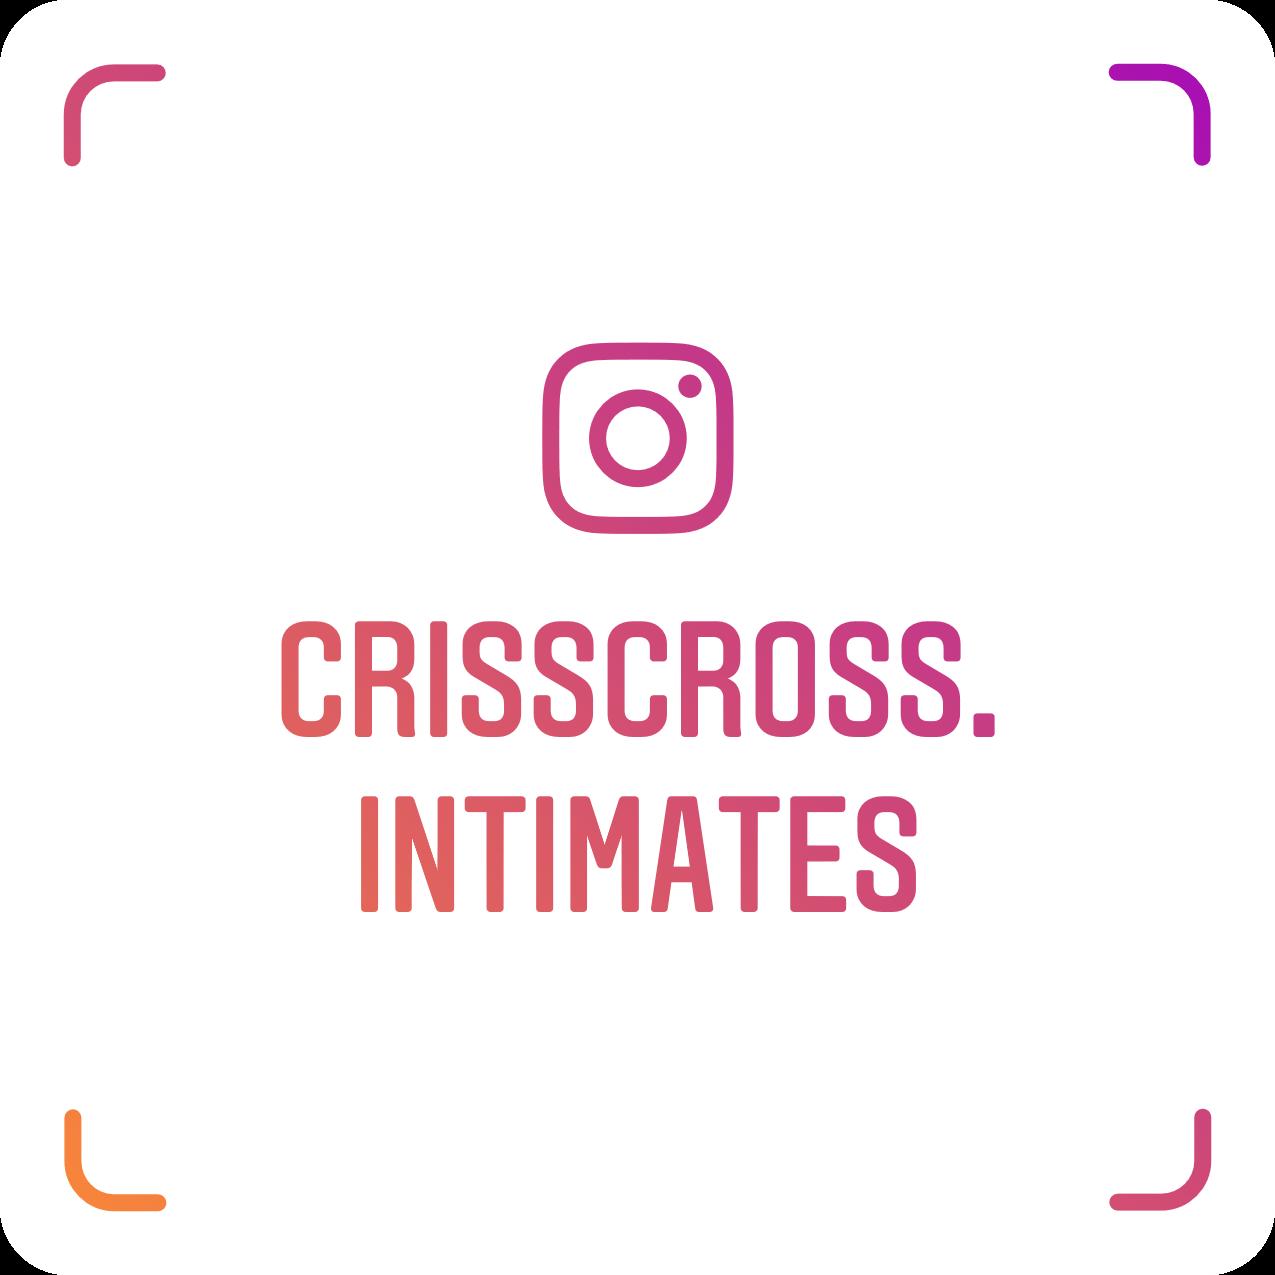 crisscross.intimates_nametag.png